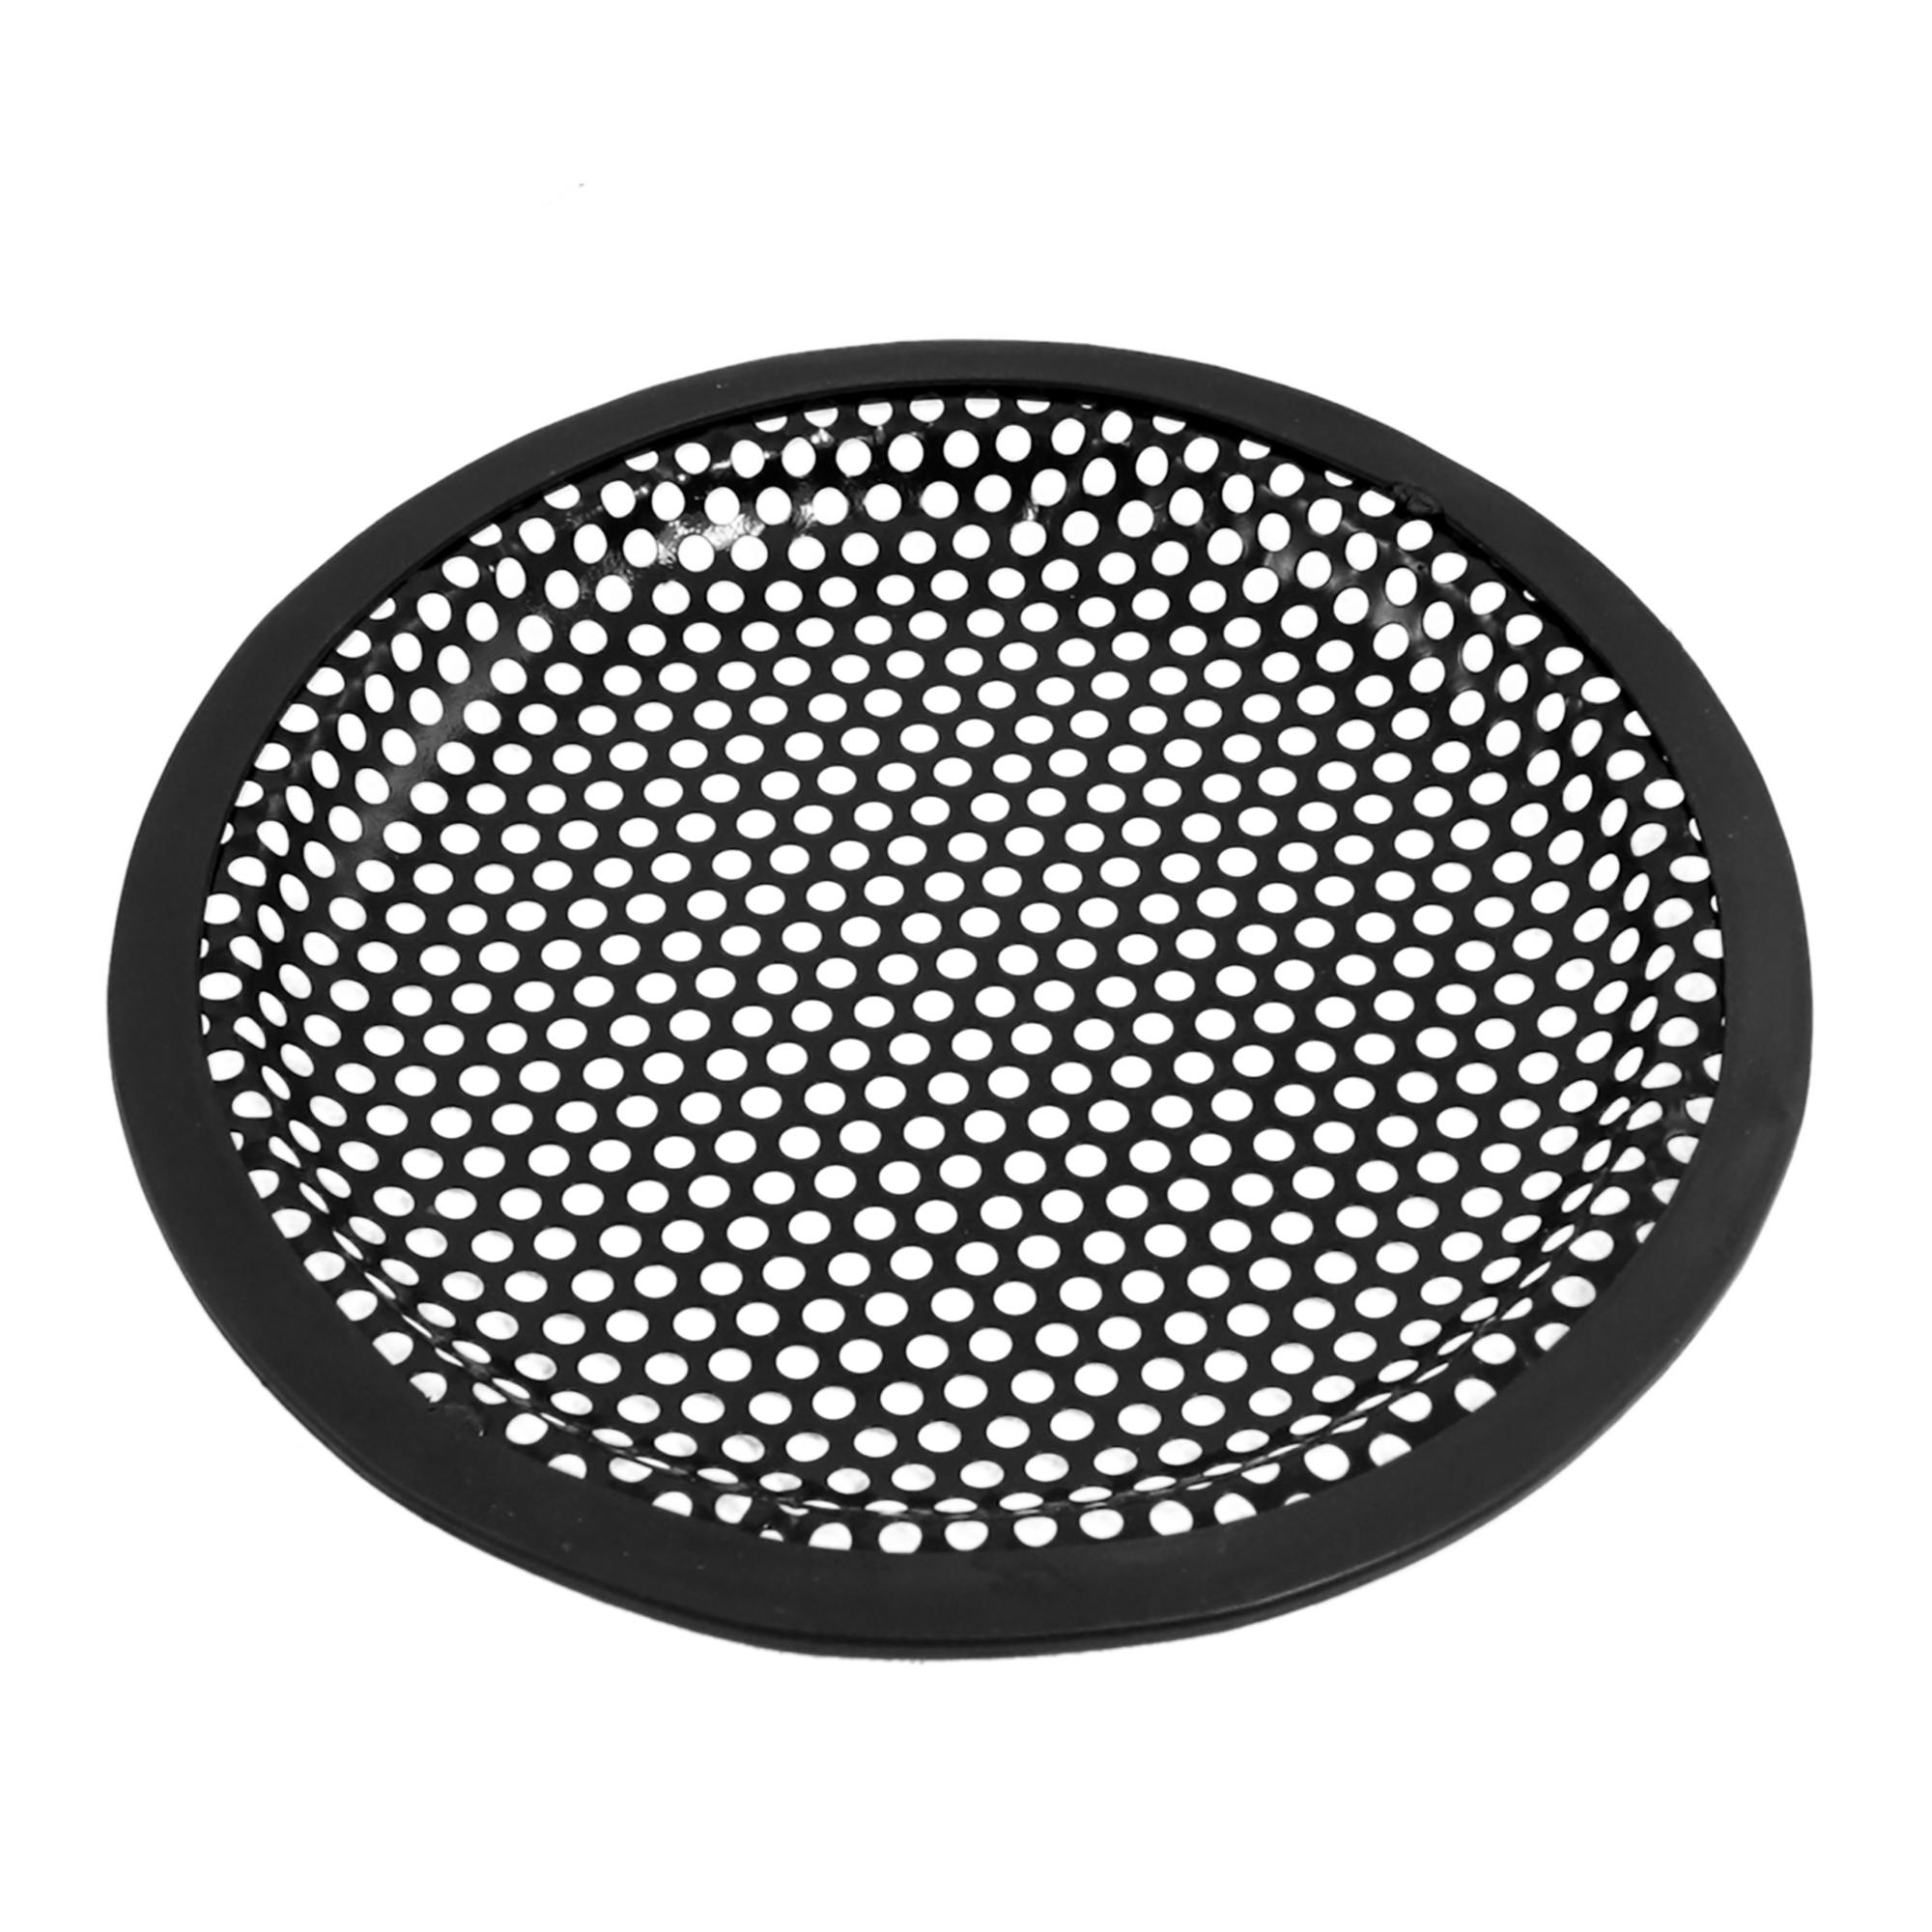 "6"" Universal Metal Car Audio Speaker Sub Woofer Grill Cover Black"